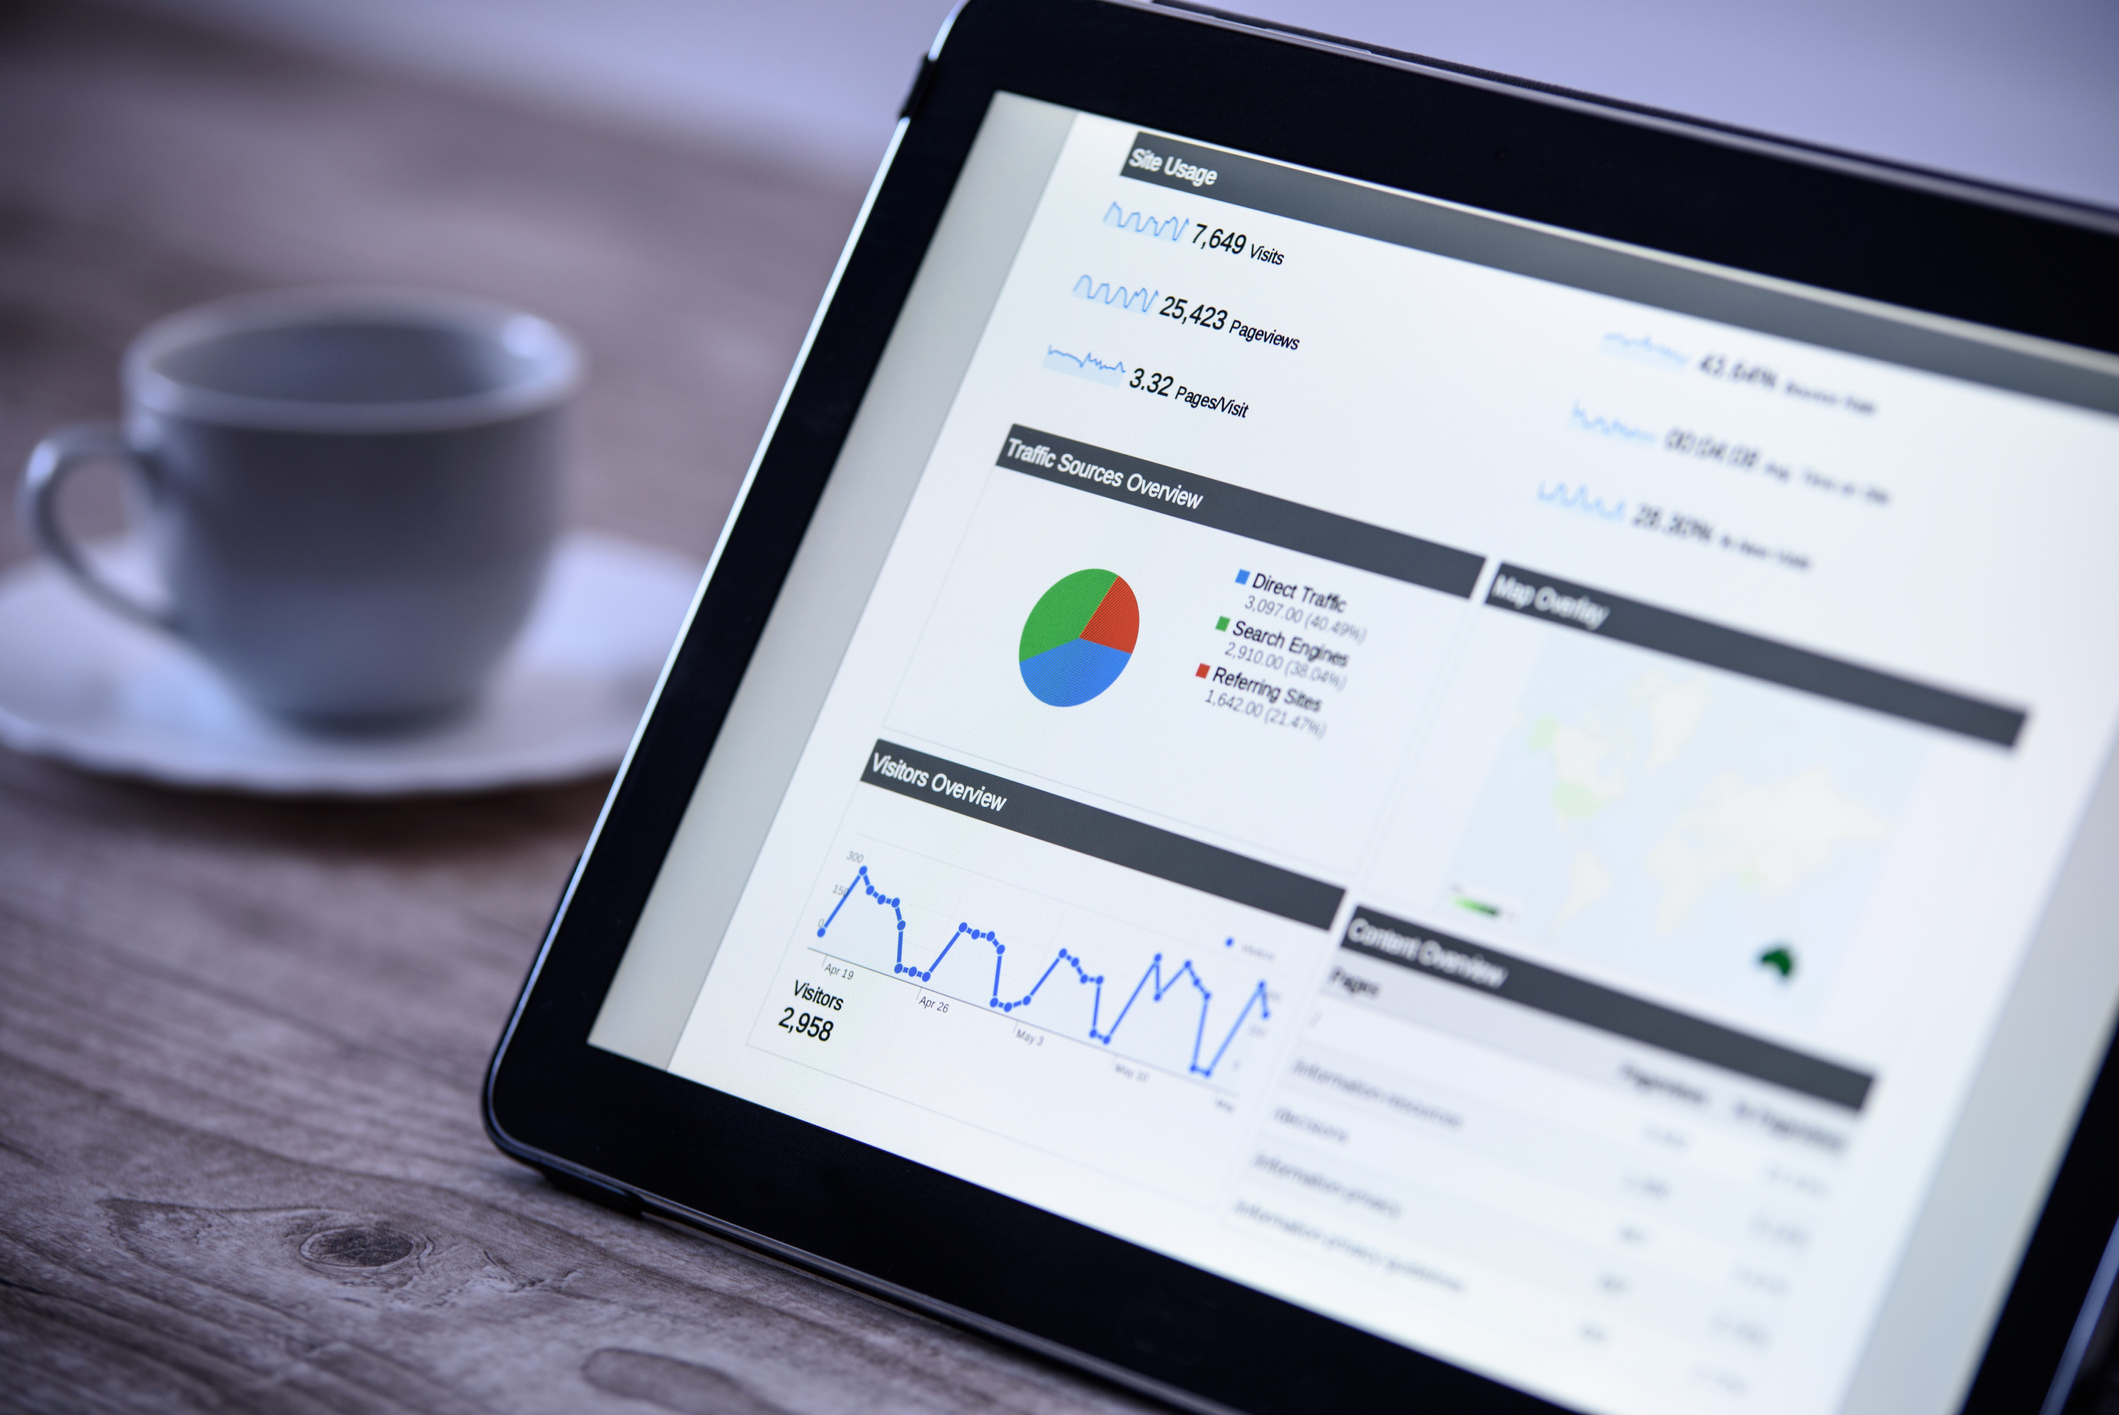 screen shot on a computer showing Google Analytics www.paladindigitalmarketing.com